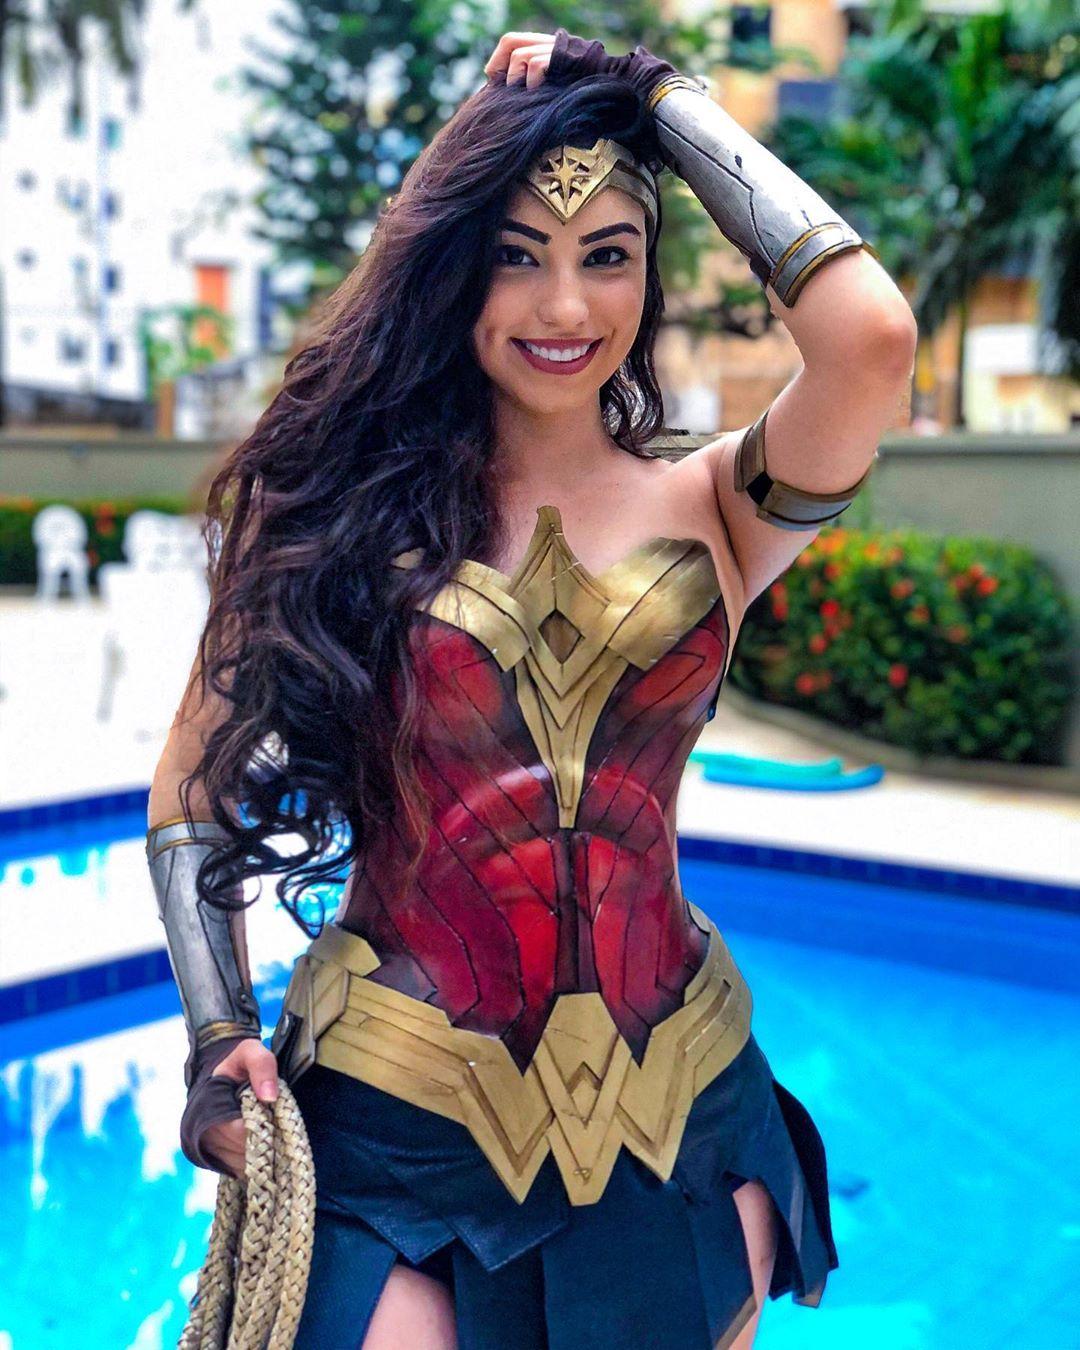 Wonderwoman Cosplay by juulianalopez